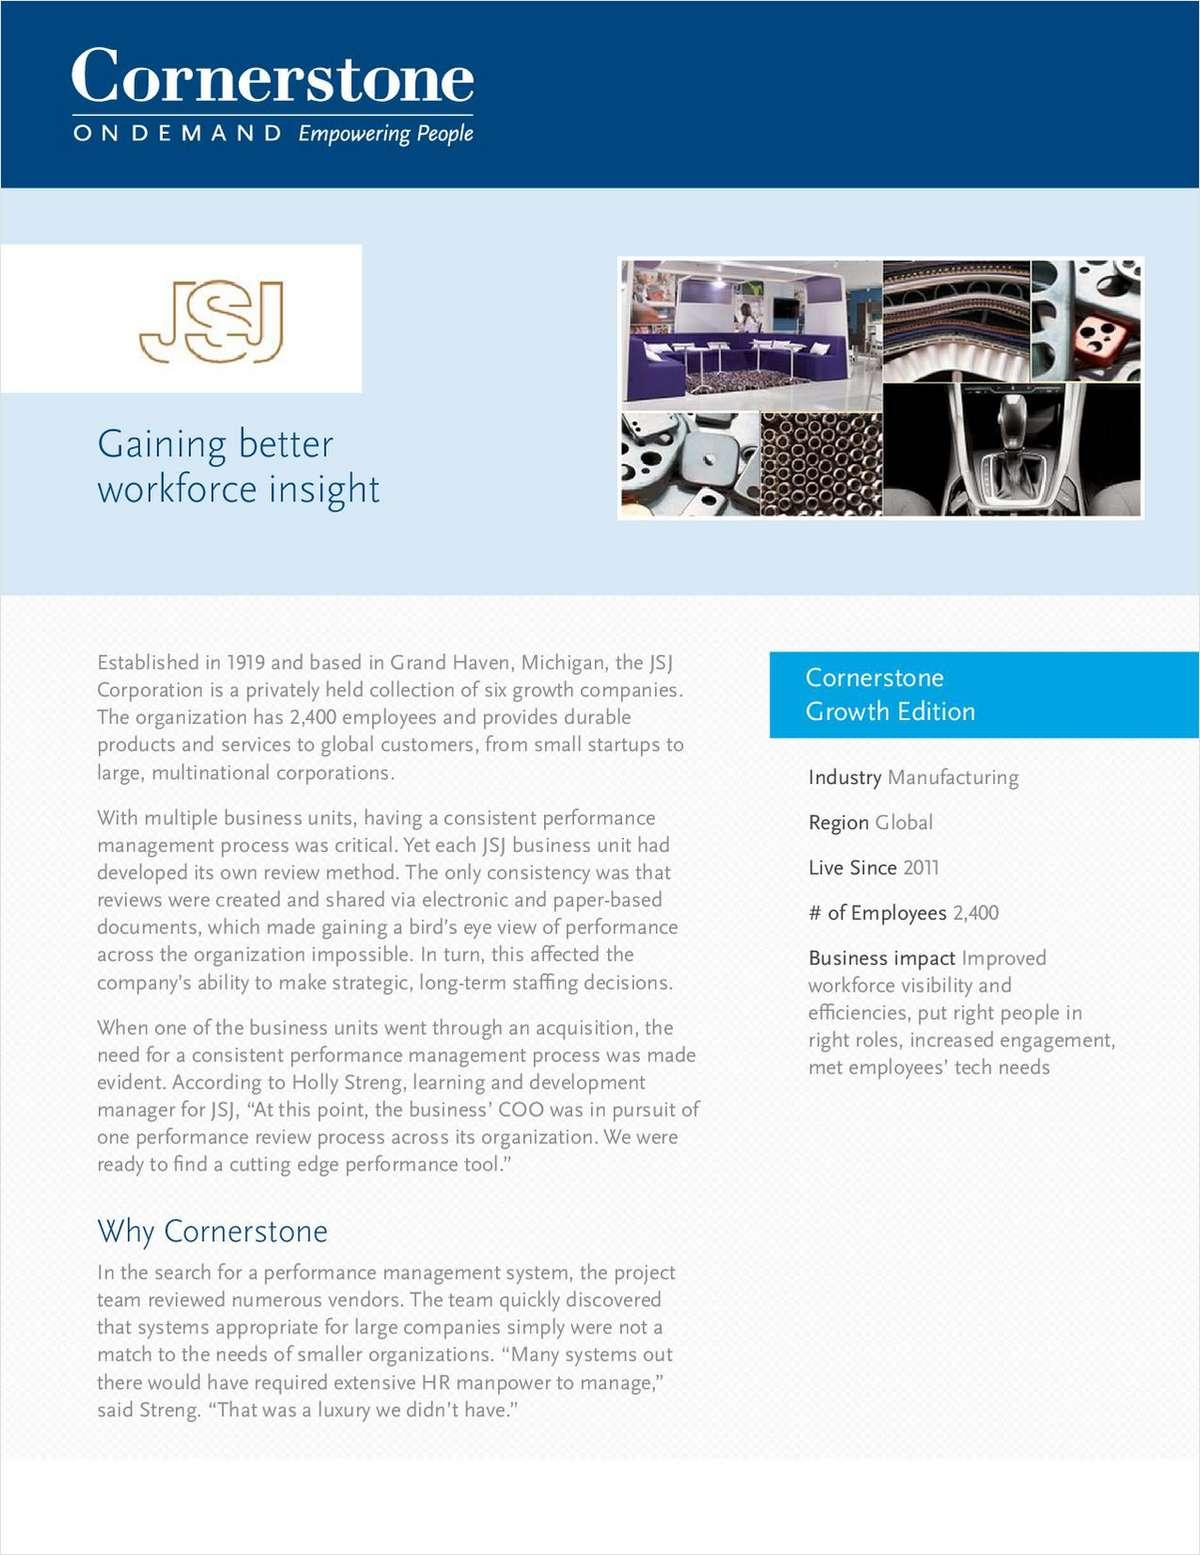 JSJ Case Study: Gaining Better Workforce Insight